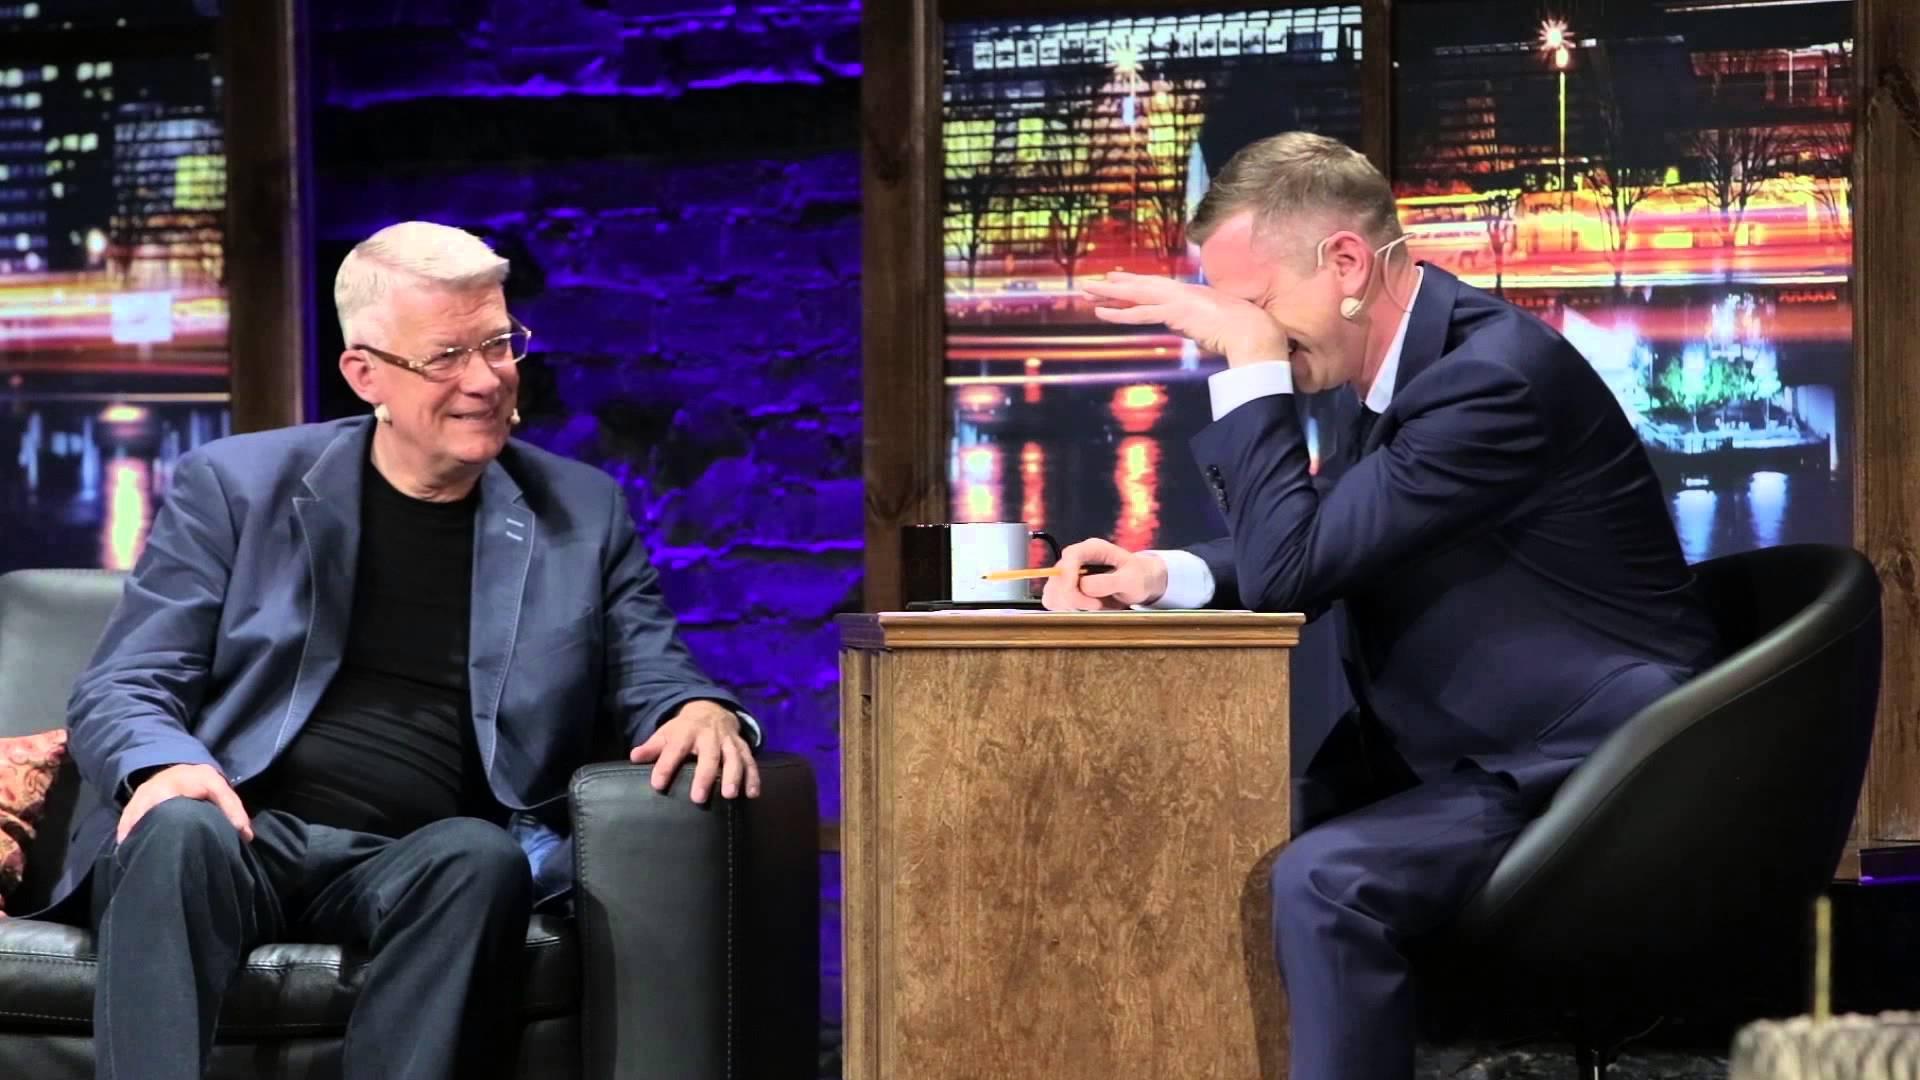 VIDEO: Zatlers joko par Saeimas atlaišanu un iedzeršanu!